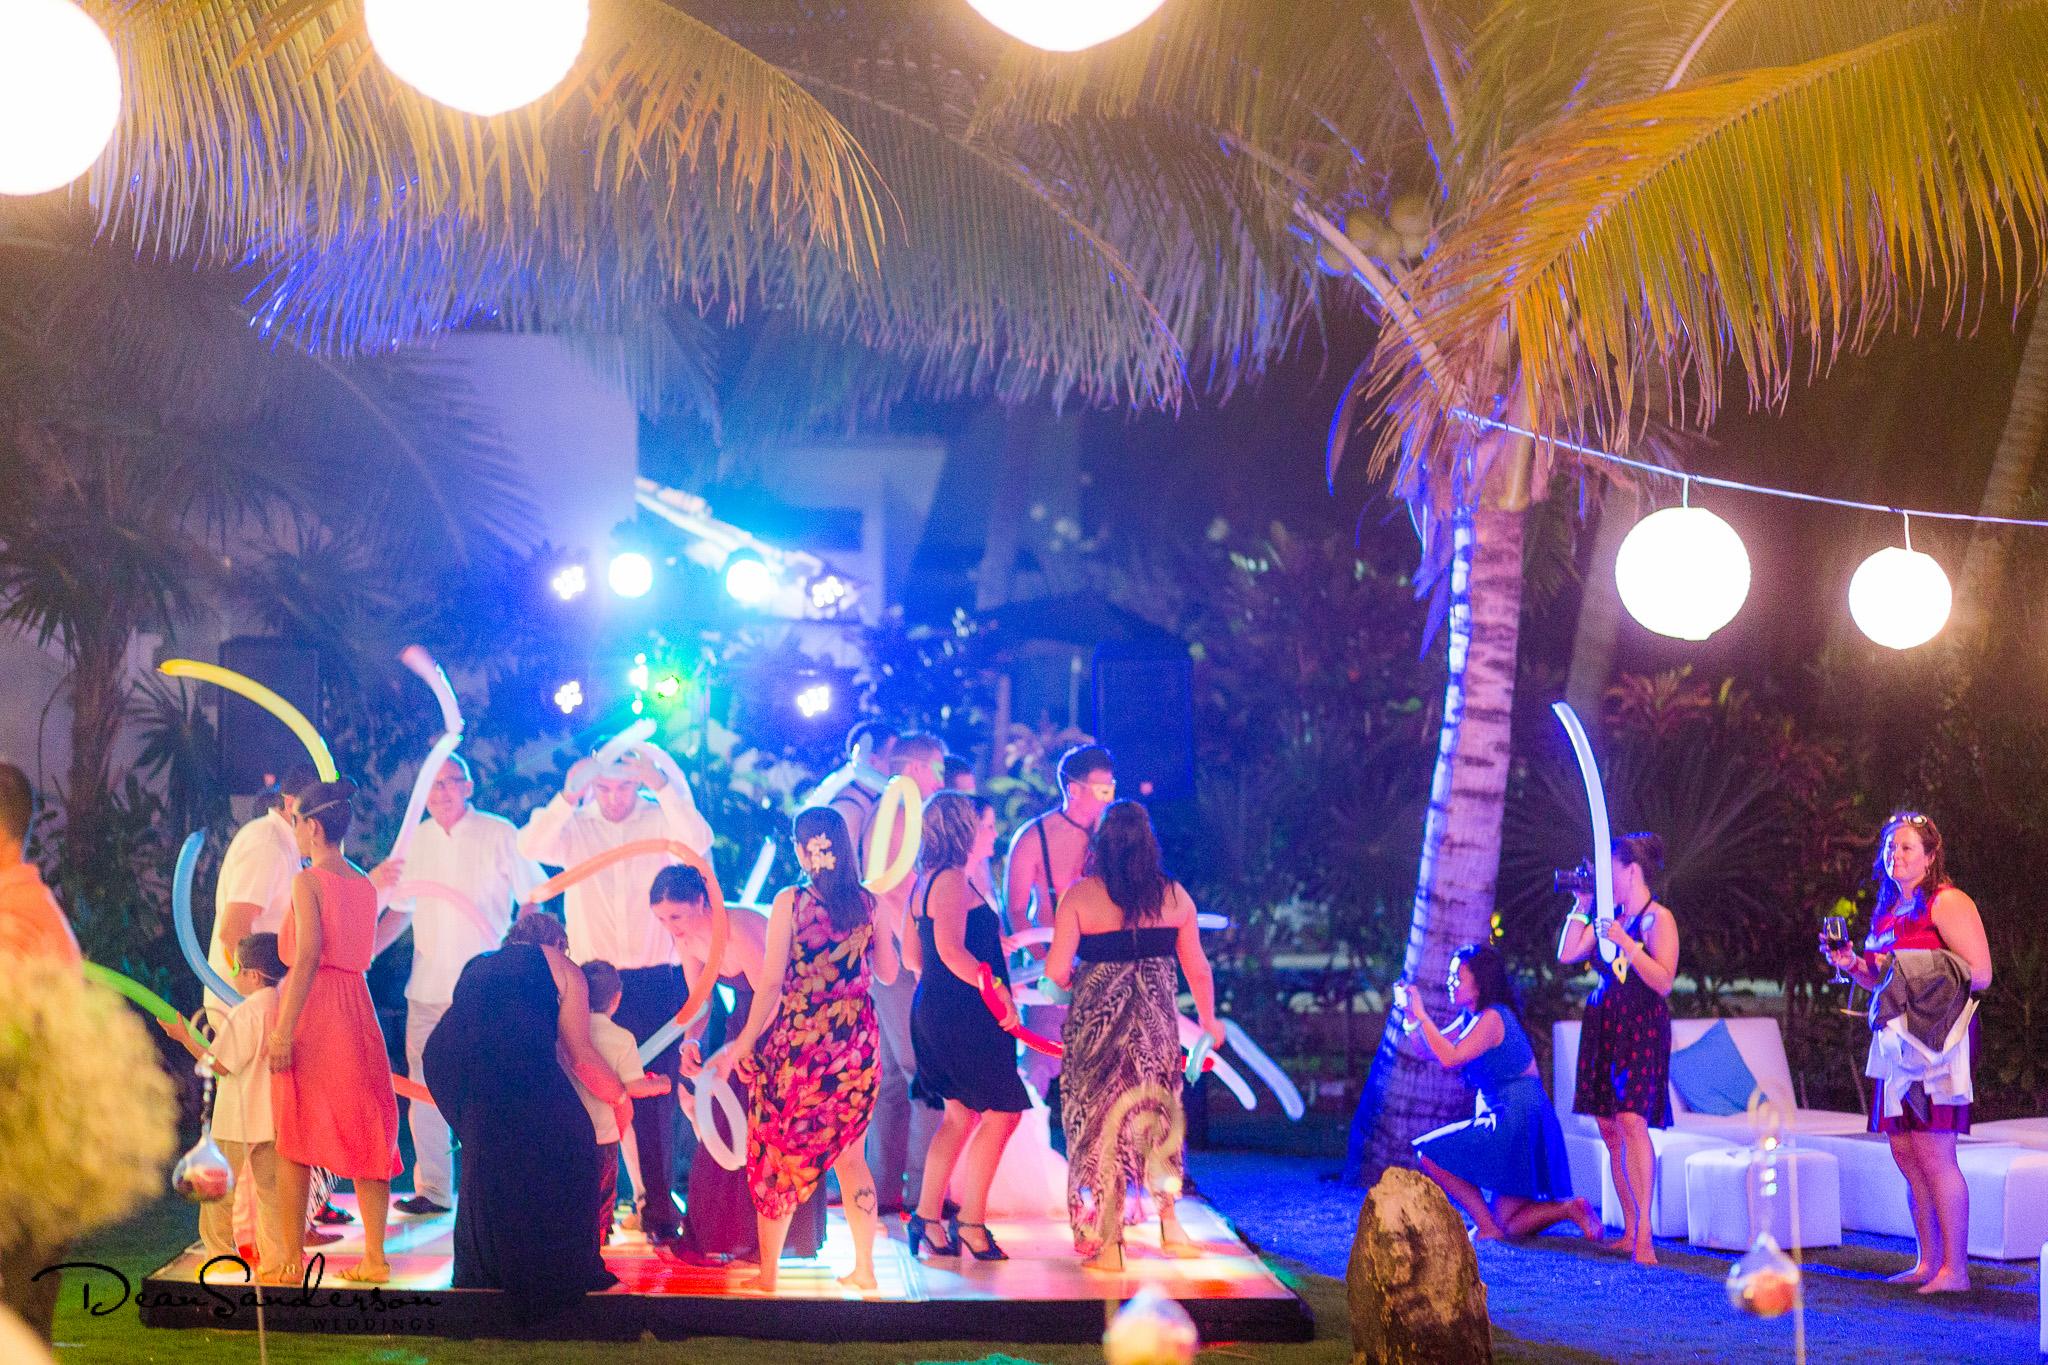 Afton_Adam_4124Weddings in Playa Destination Wedding Planners